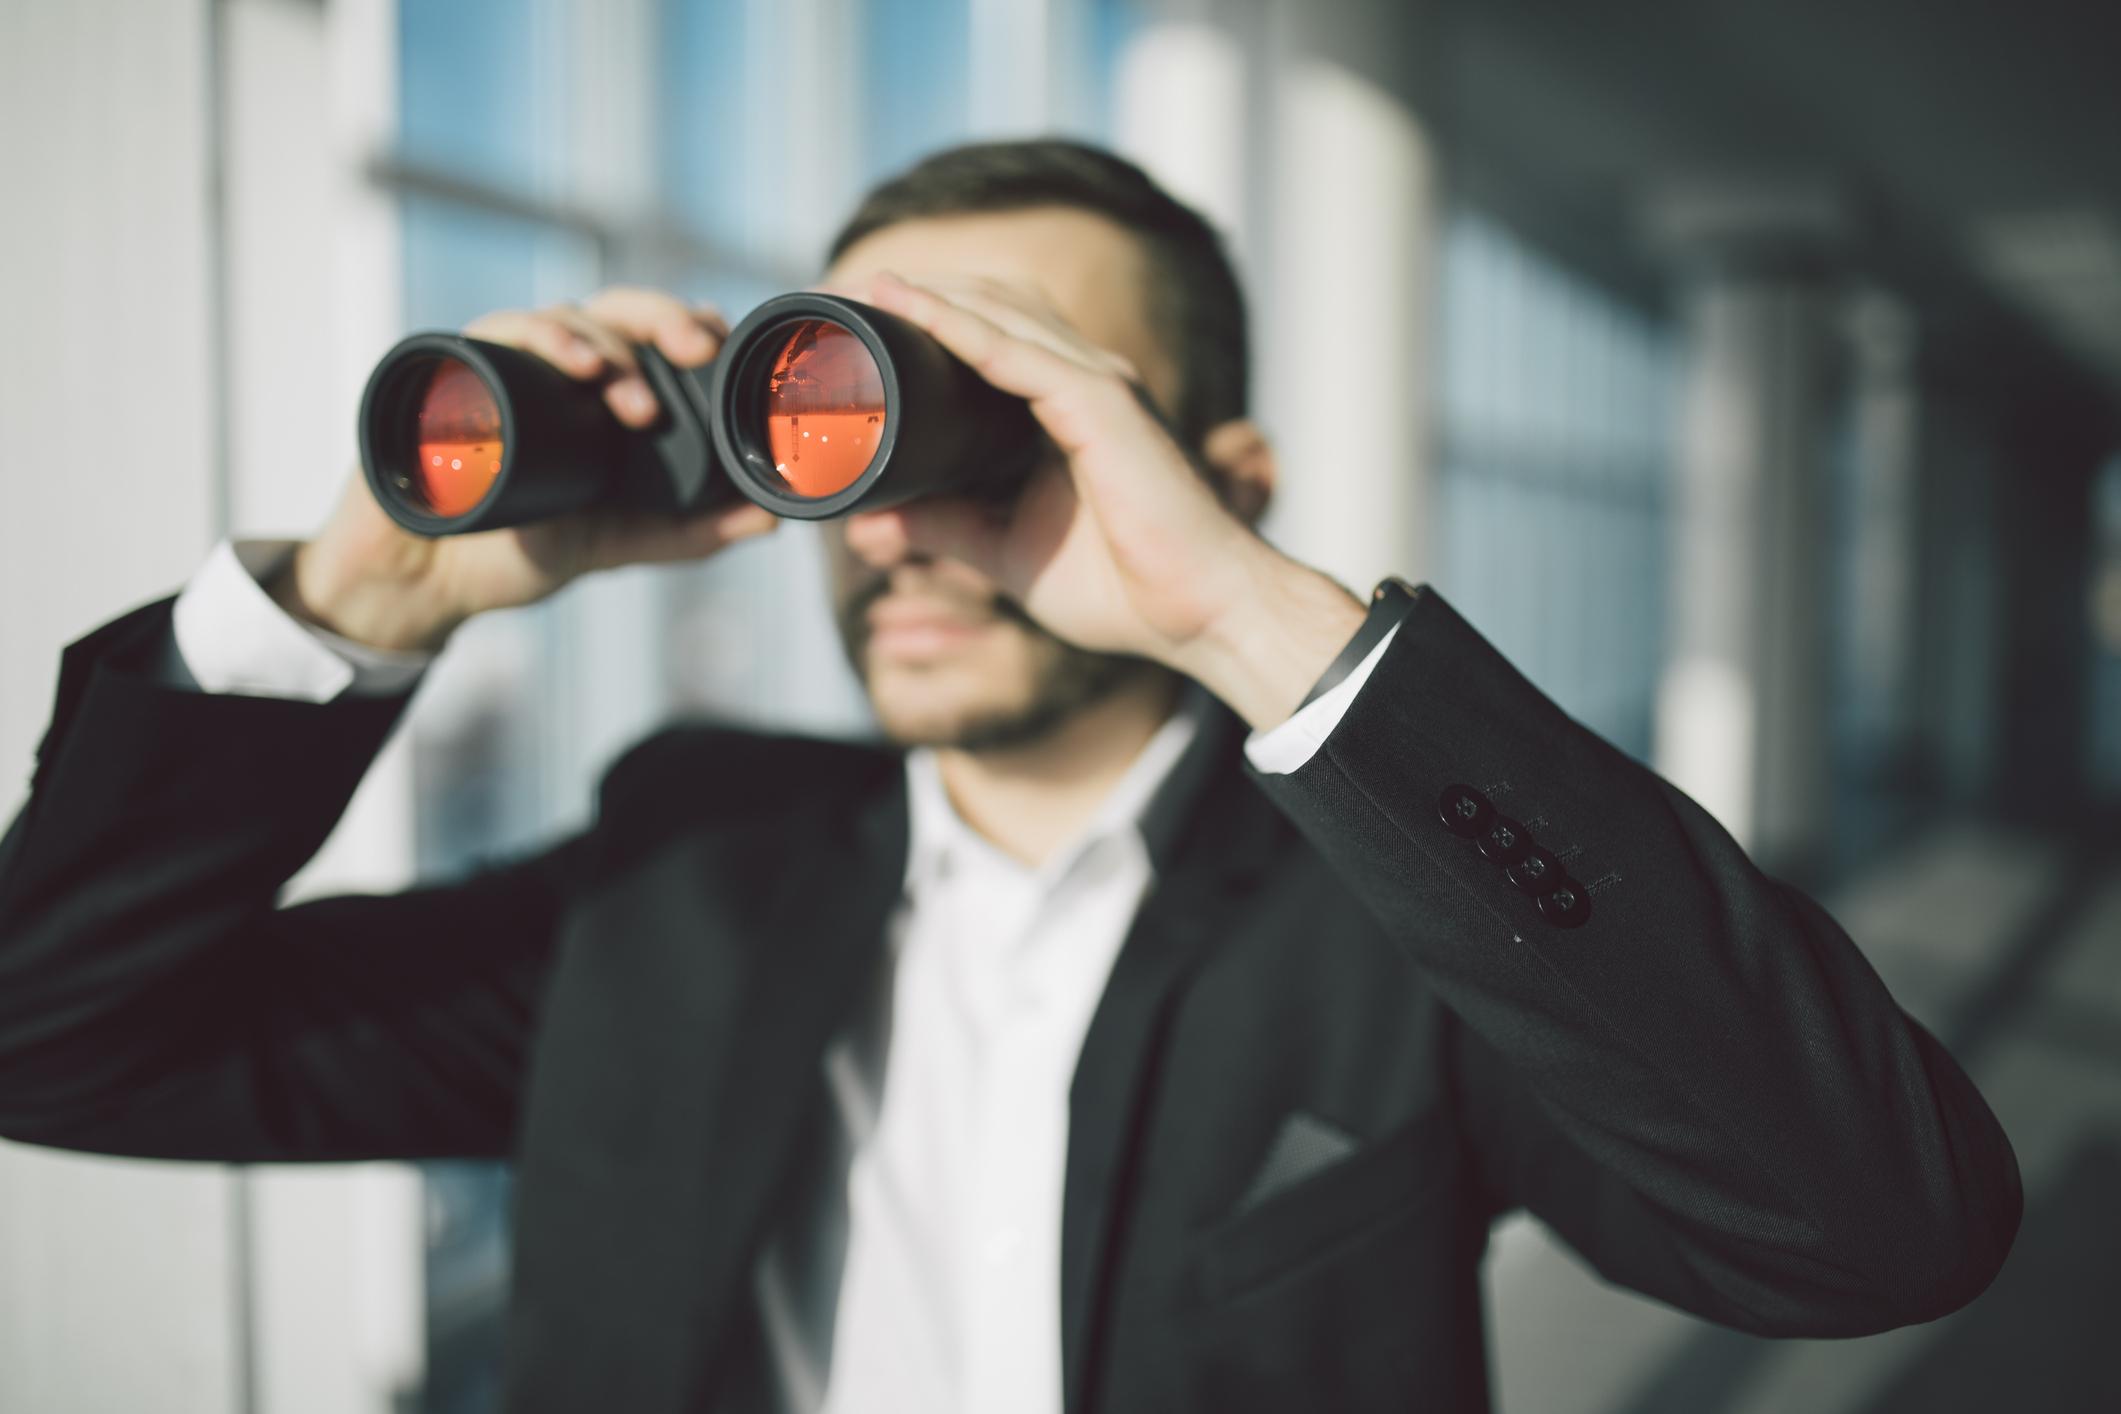 A man in a suit looking through binoculars